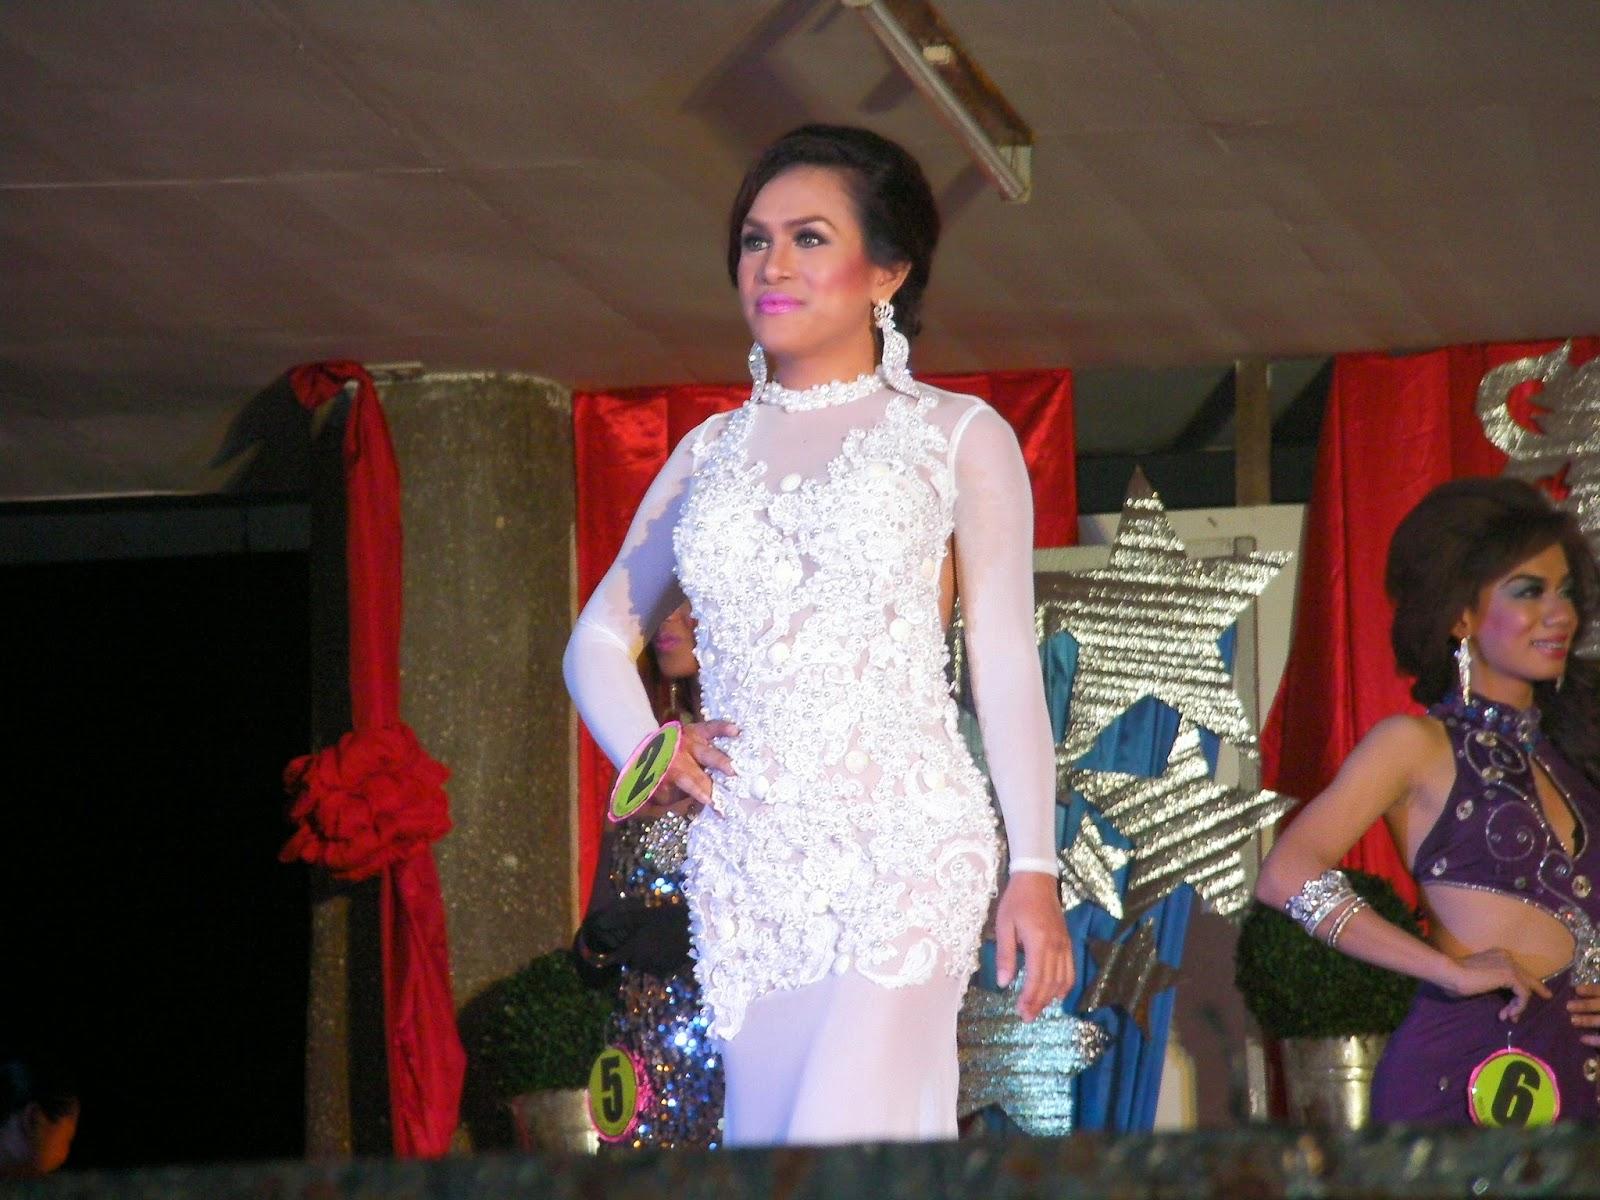 Miss gay Ormoc 2014